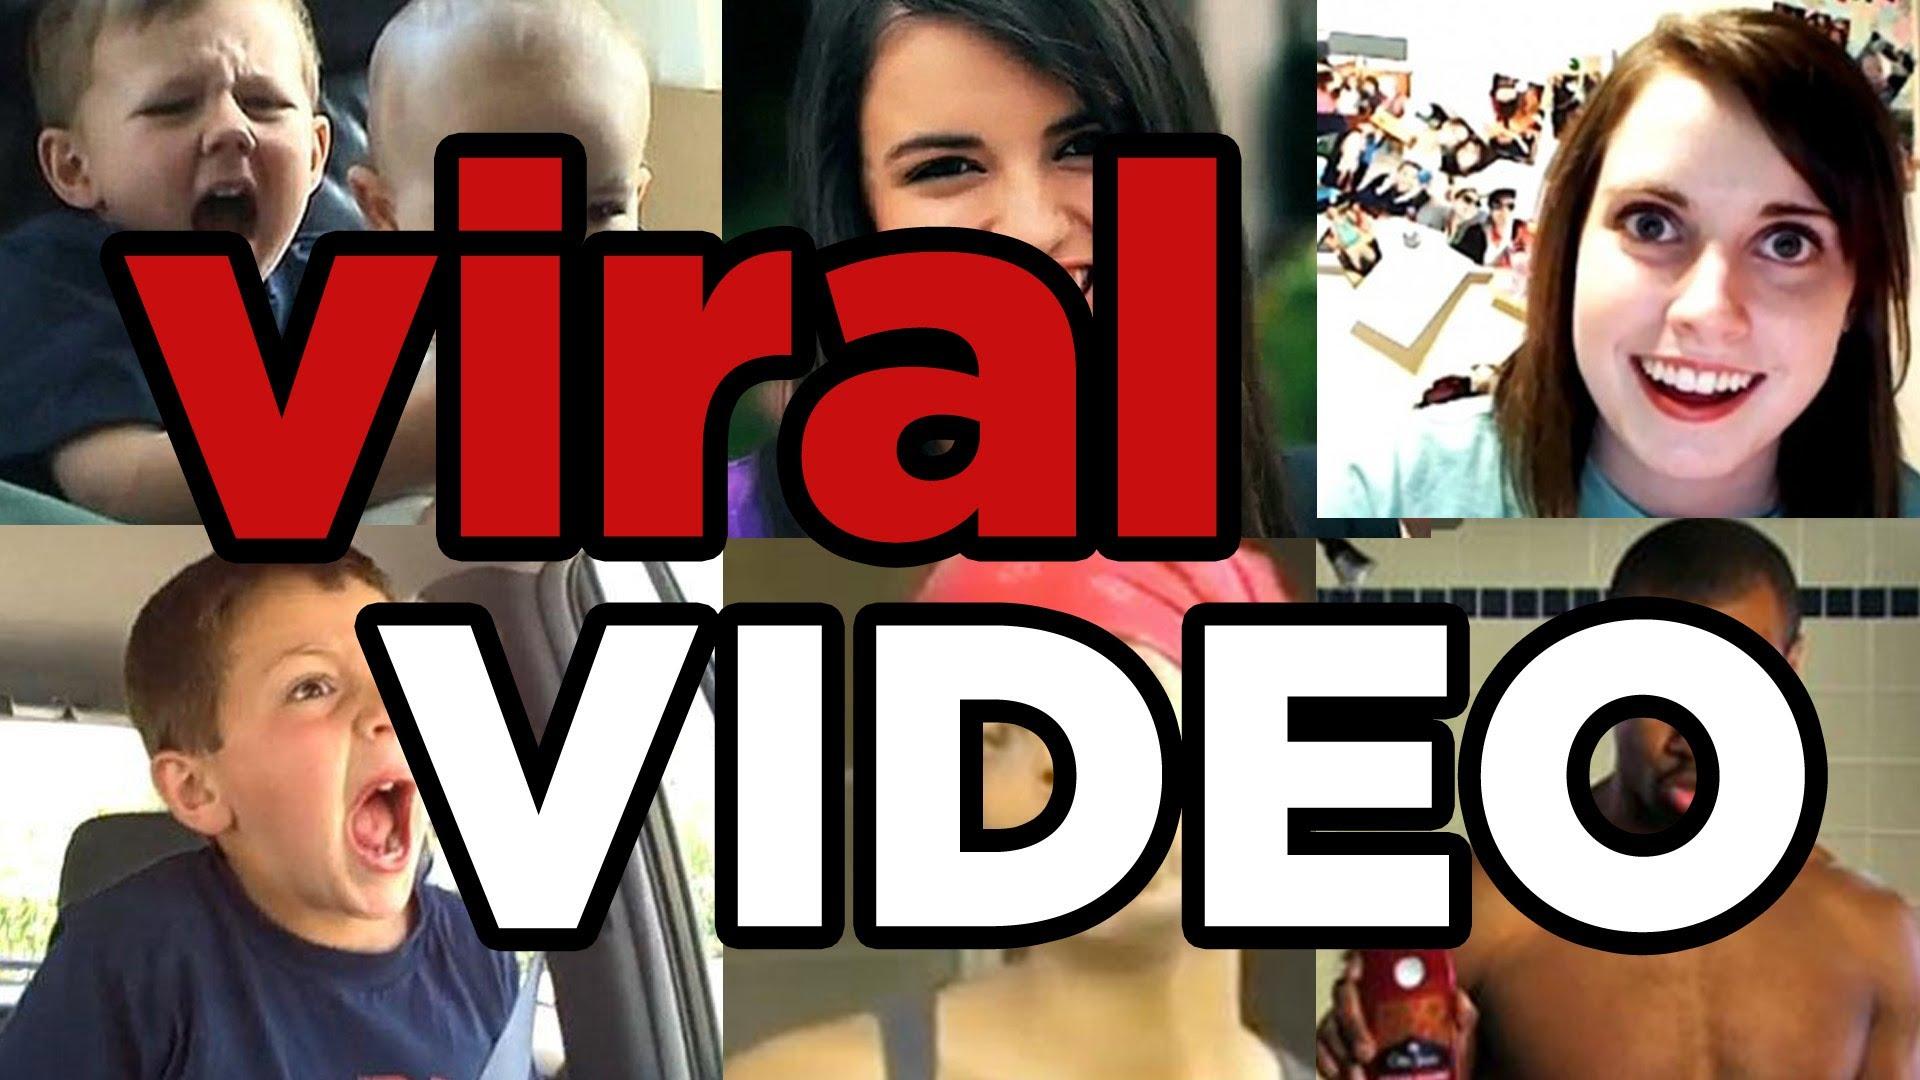 Viral Videos - 2018's Best Viral Videos